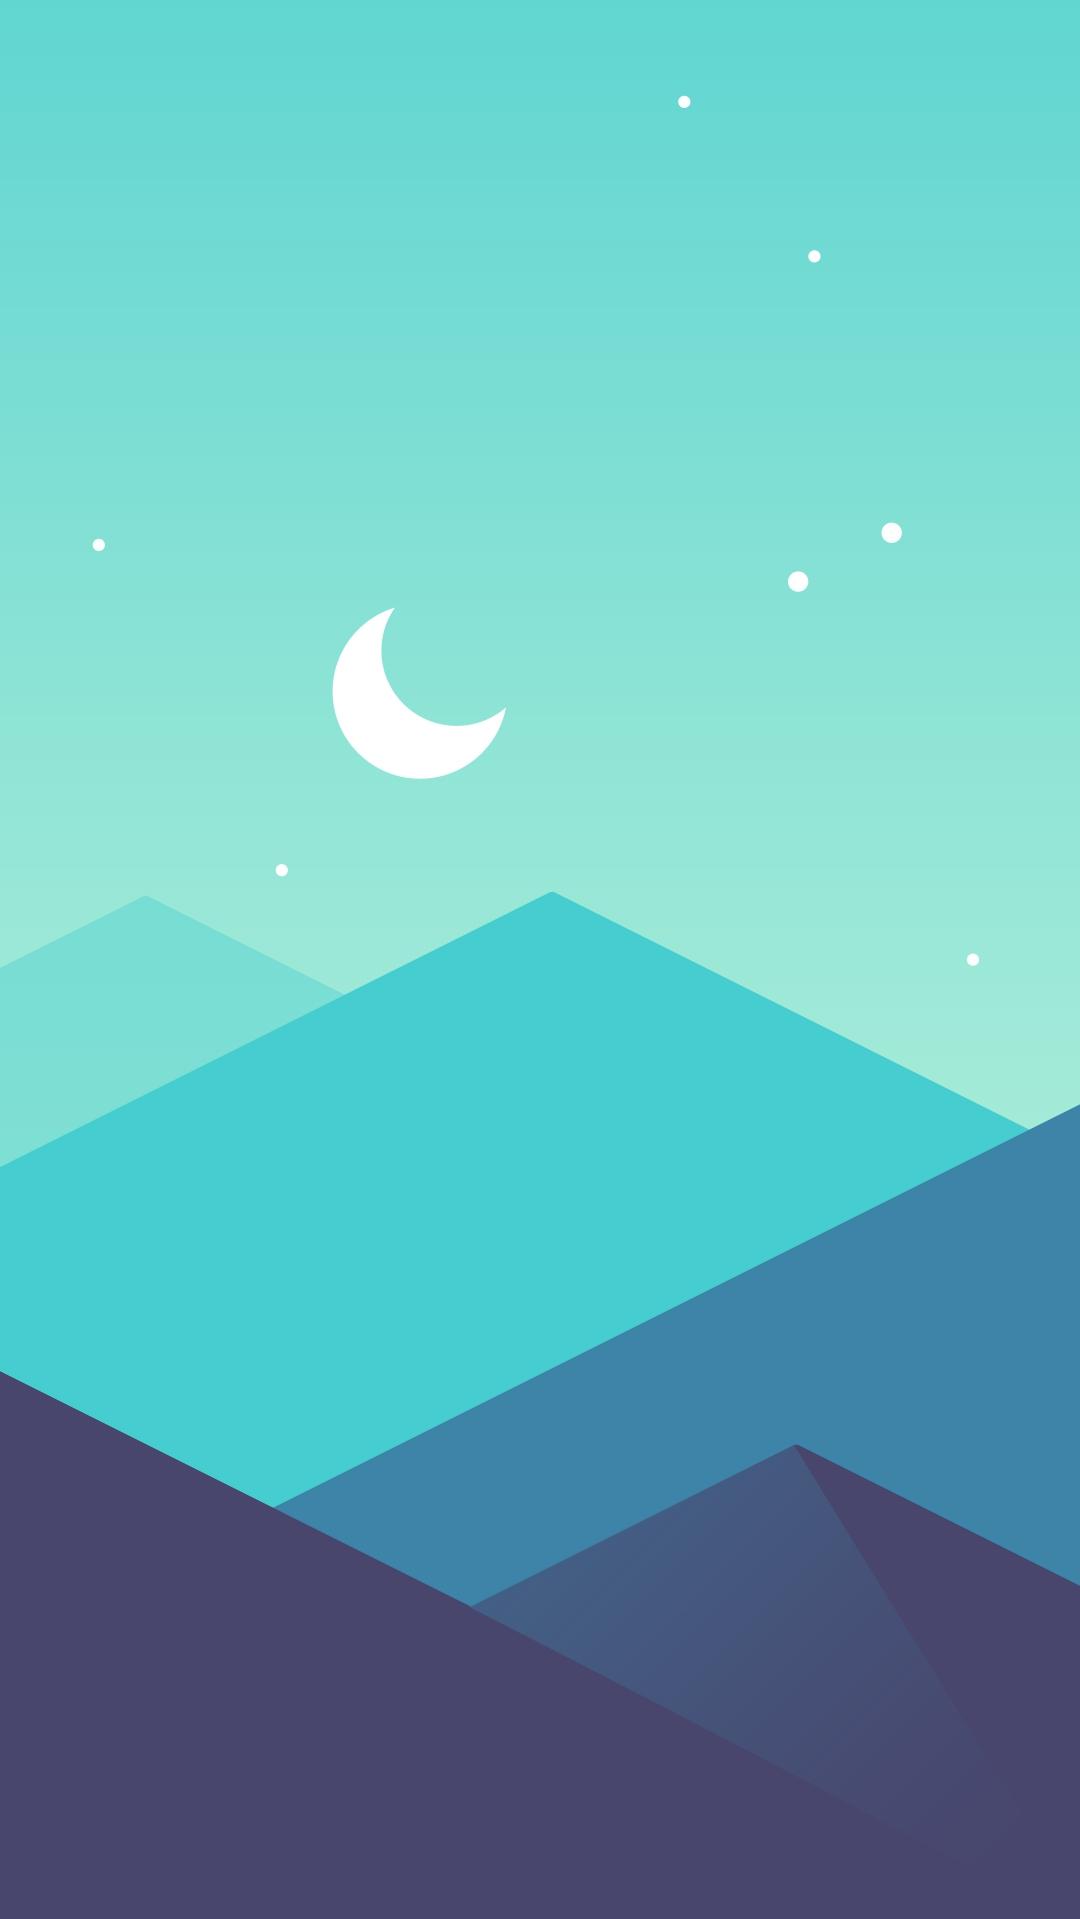 Light Green Iphone Wallpaper Minimal Mountains Moon Iphone Wallpaper Iphone Wallpapers